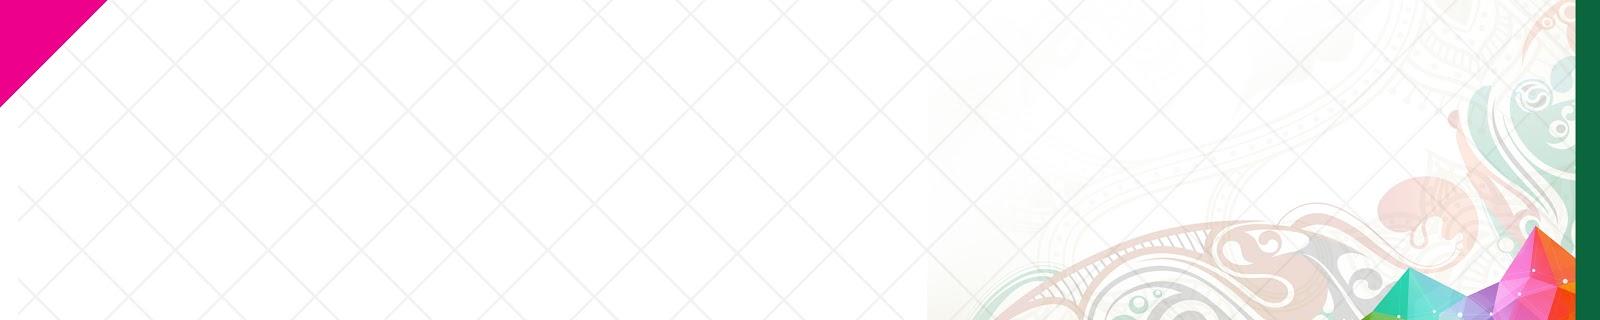 Template Desain Banner Spanduk Baliho Ukuran Besar Gratis Download Kalapahejo